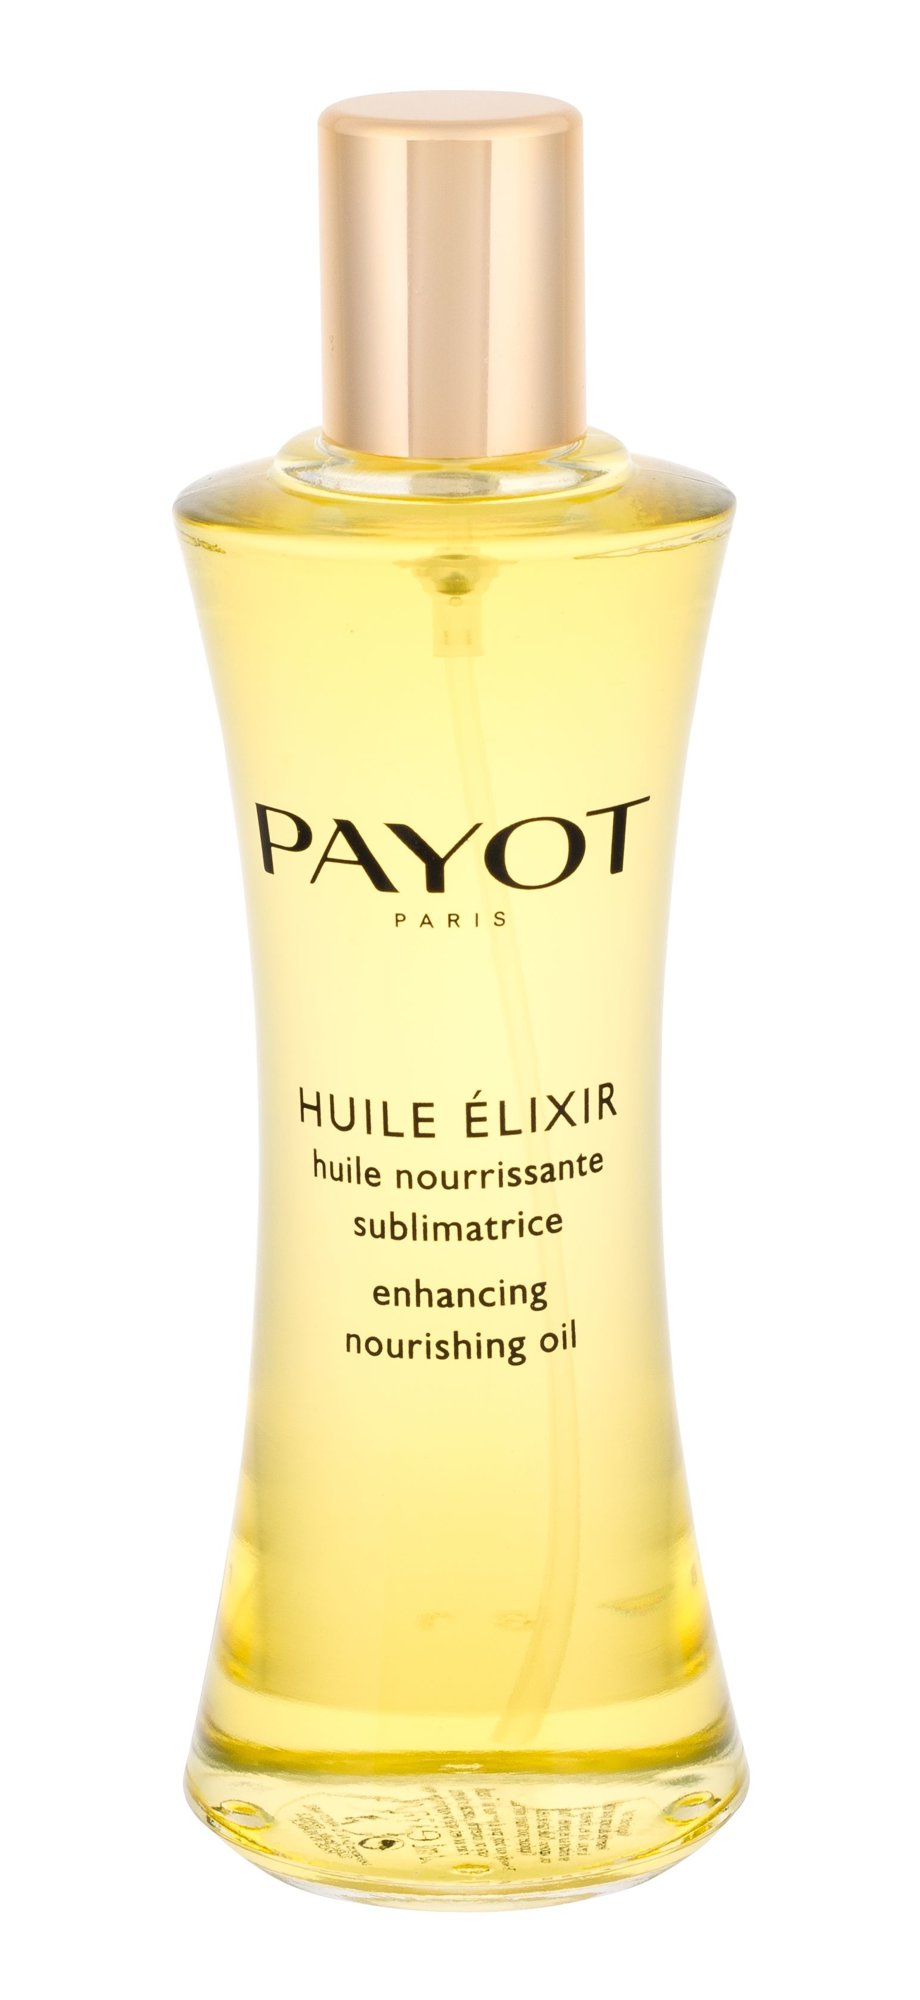 PAYOT Body Élixir Cosmetic 100ml